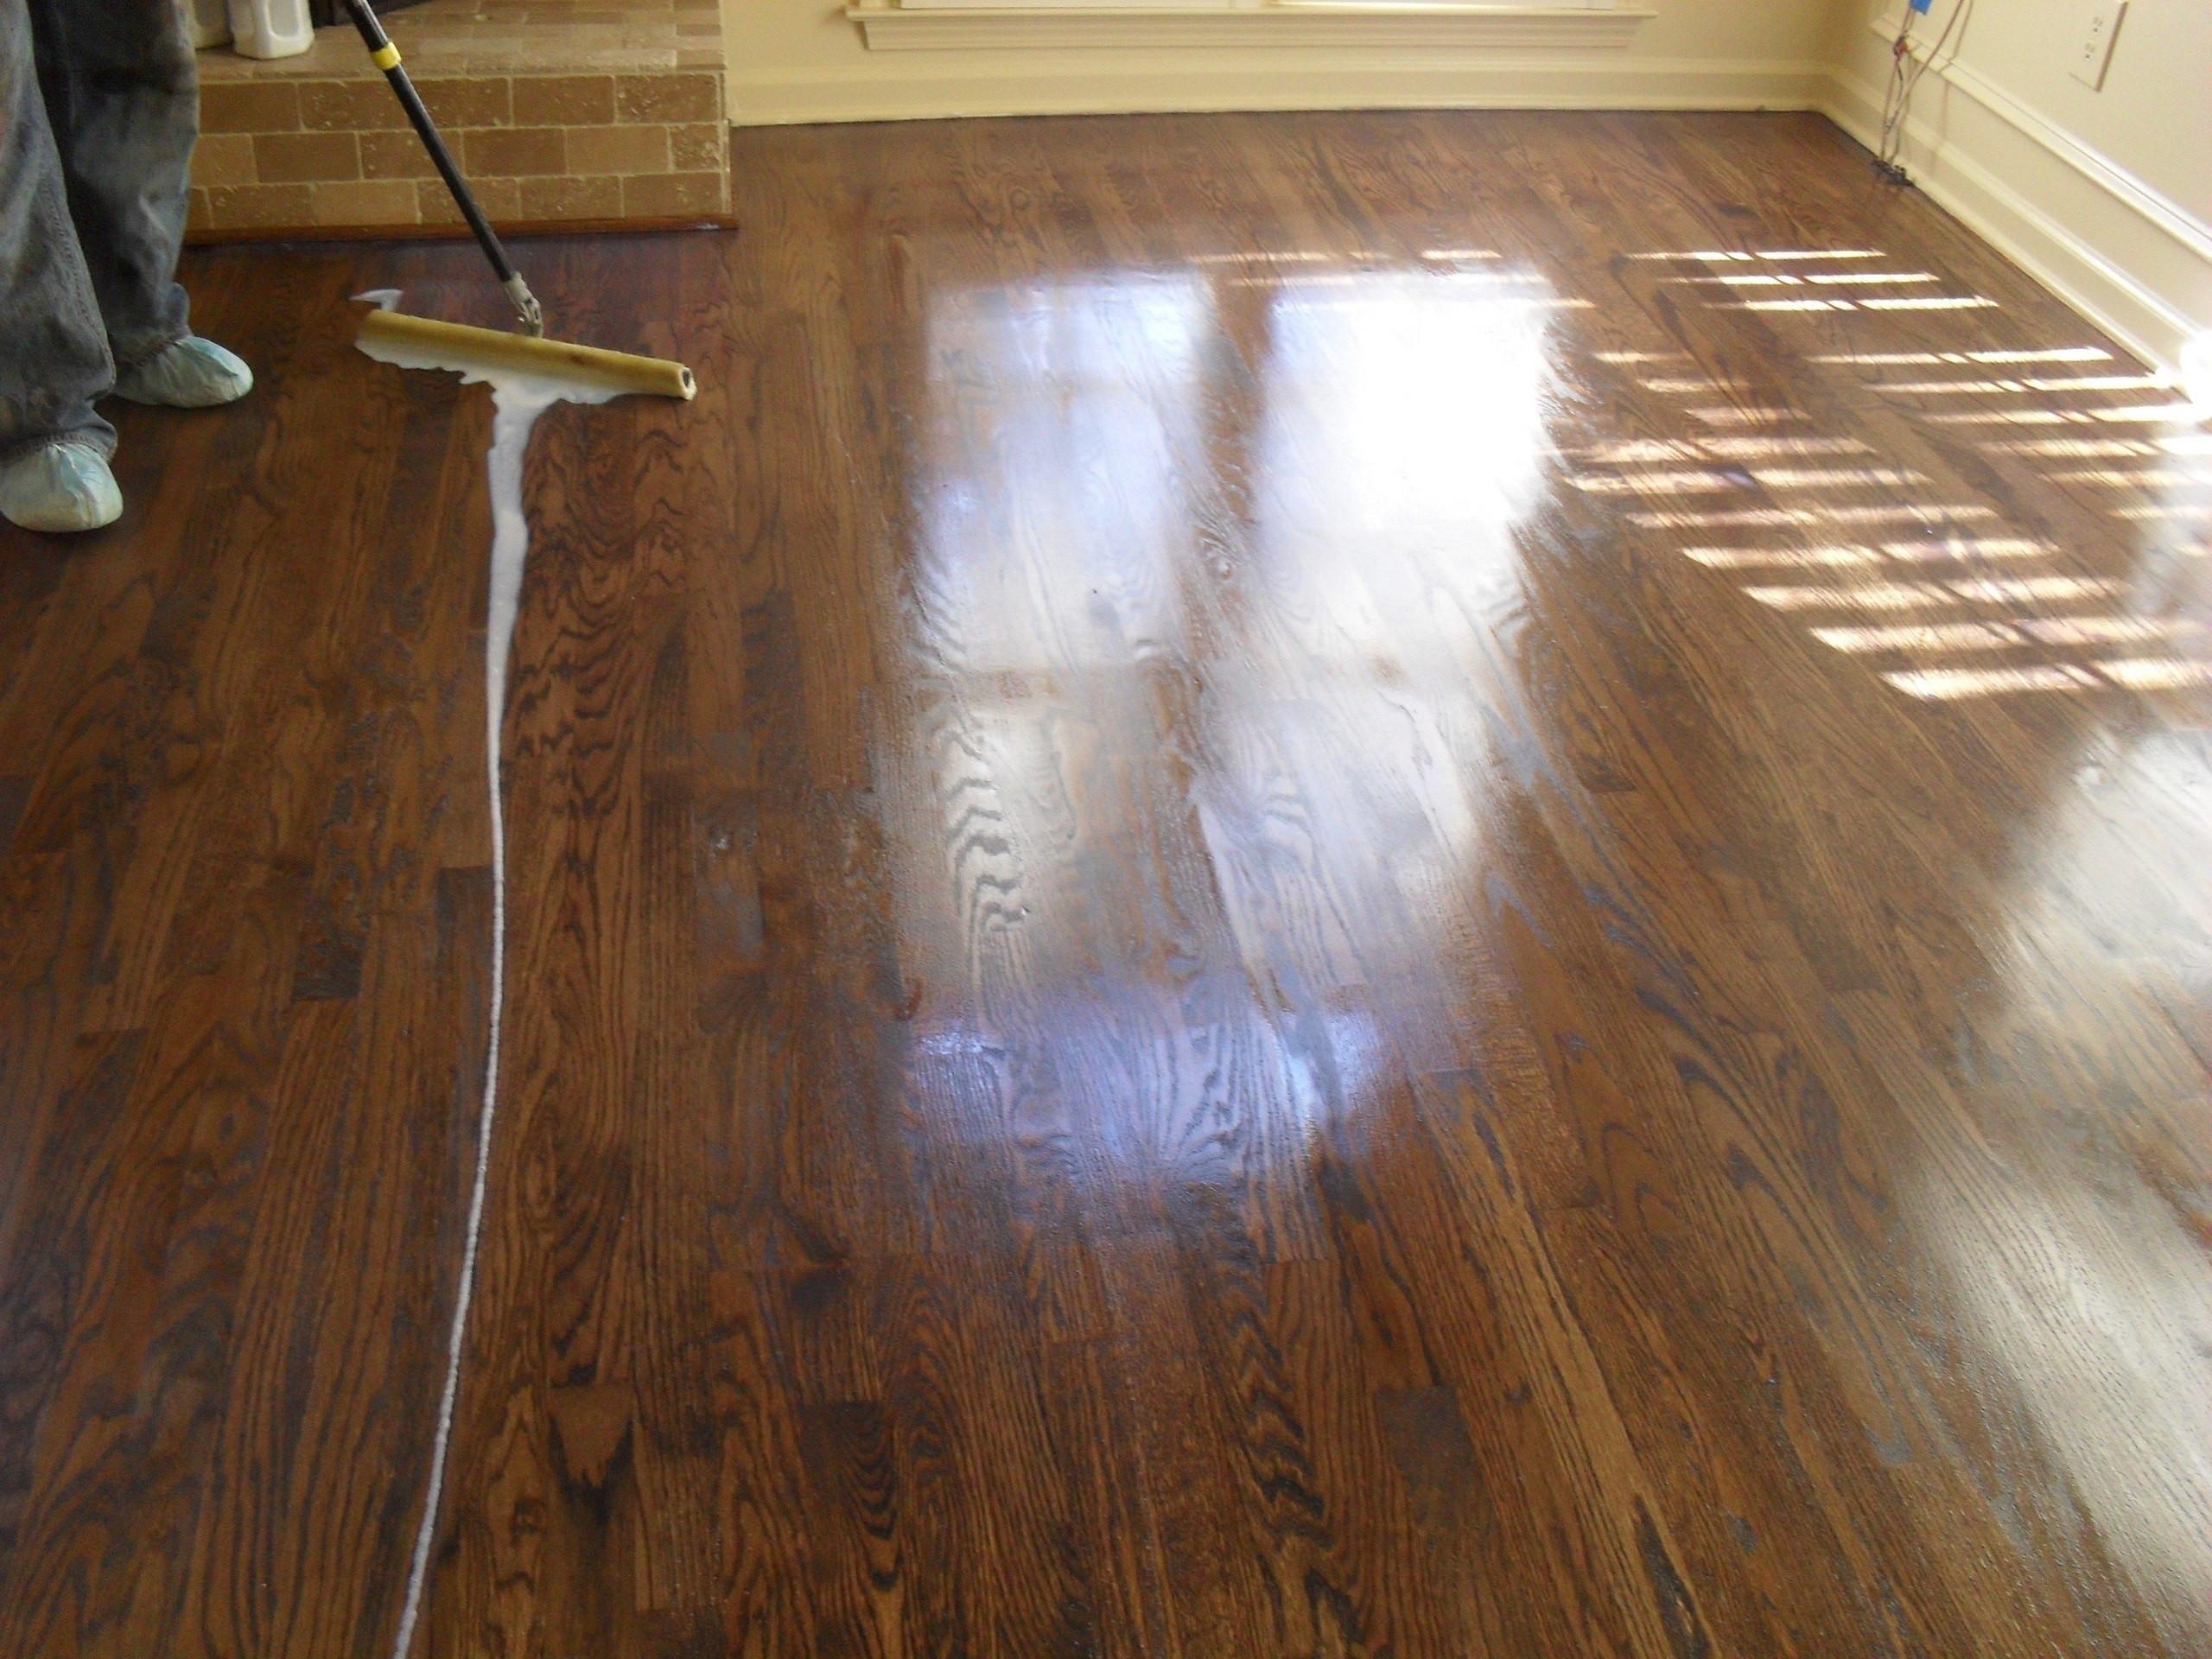 restaining hardwood floors diy of refinish hardwood floors diy restain wood floor awesome how to inside refinish hardwood floors diy restain wood floor awesome how to refinish wood floors pinterest